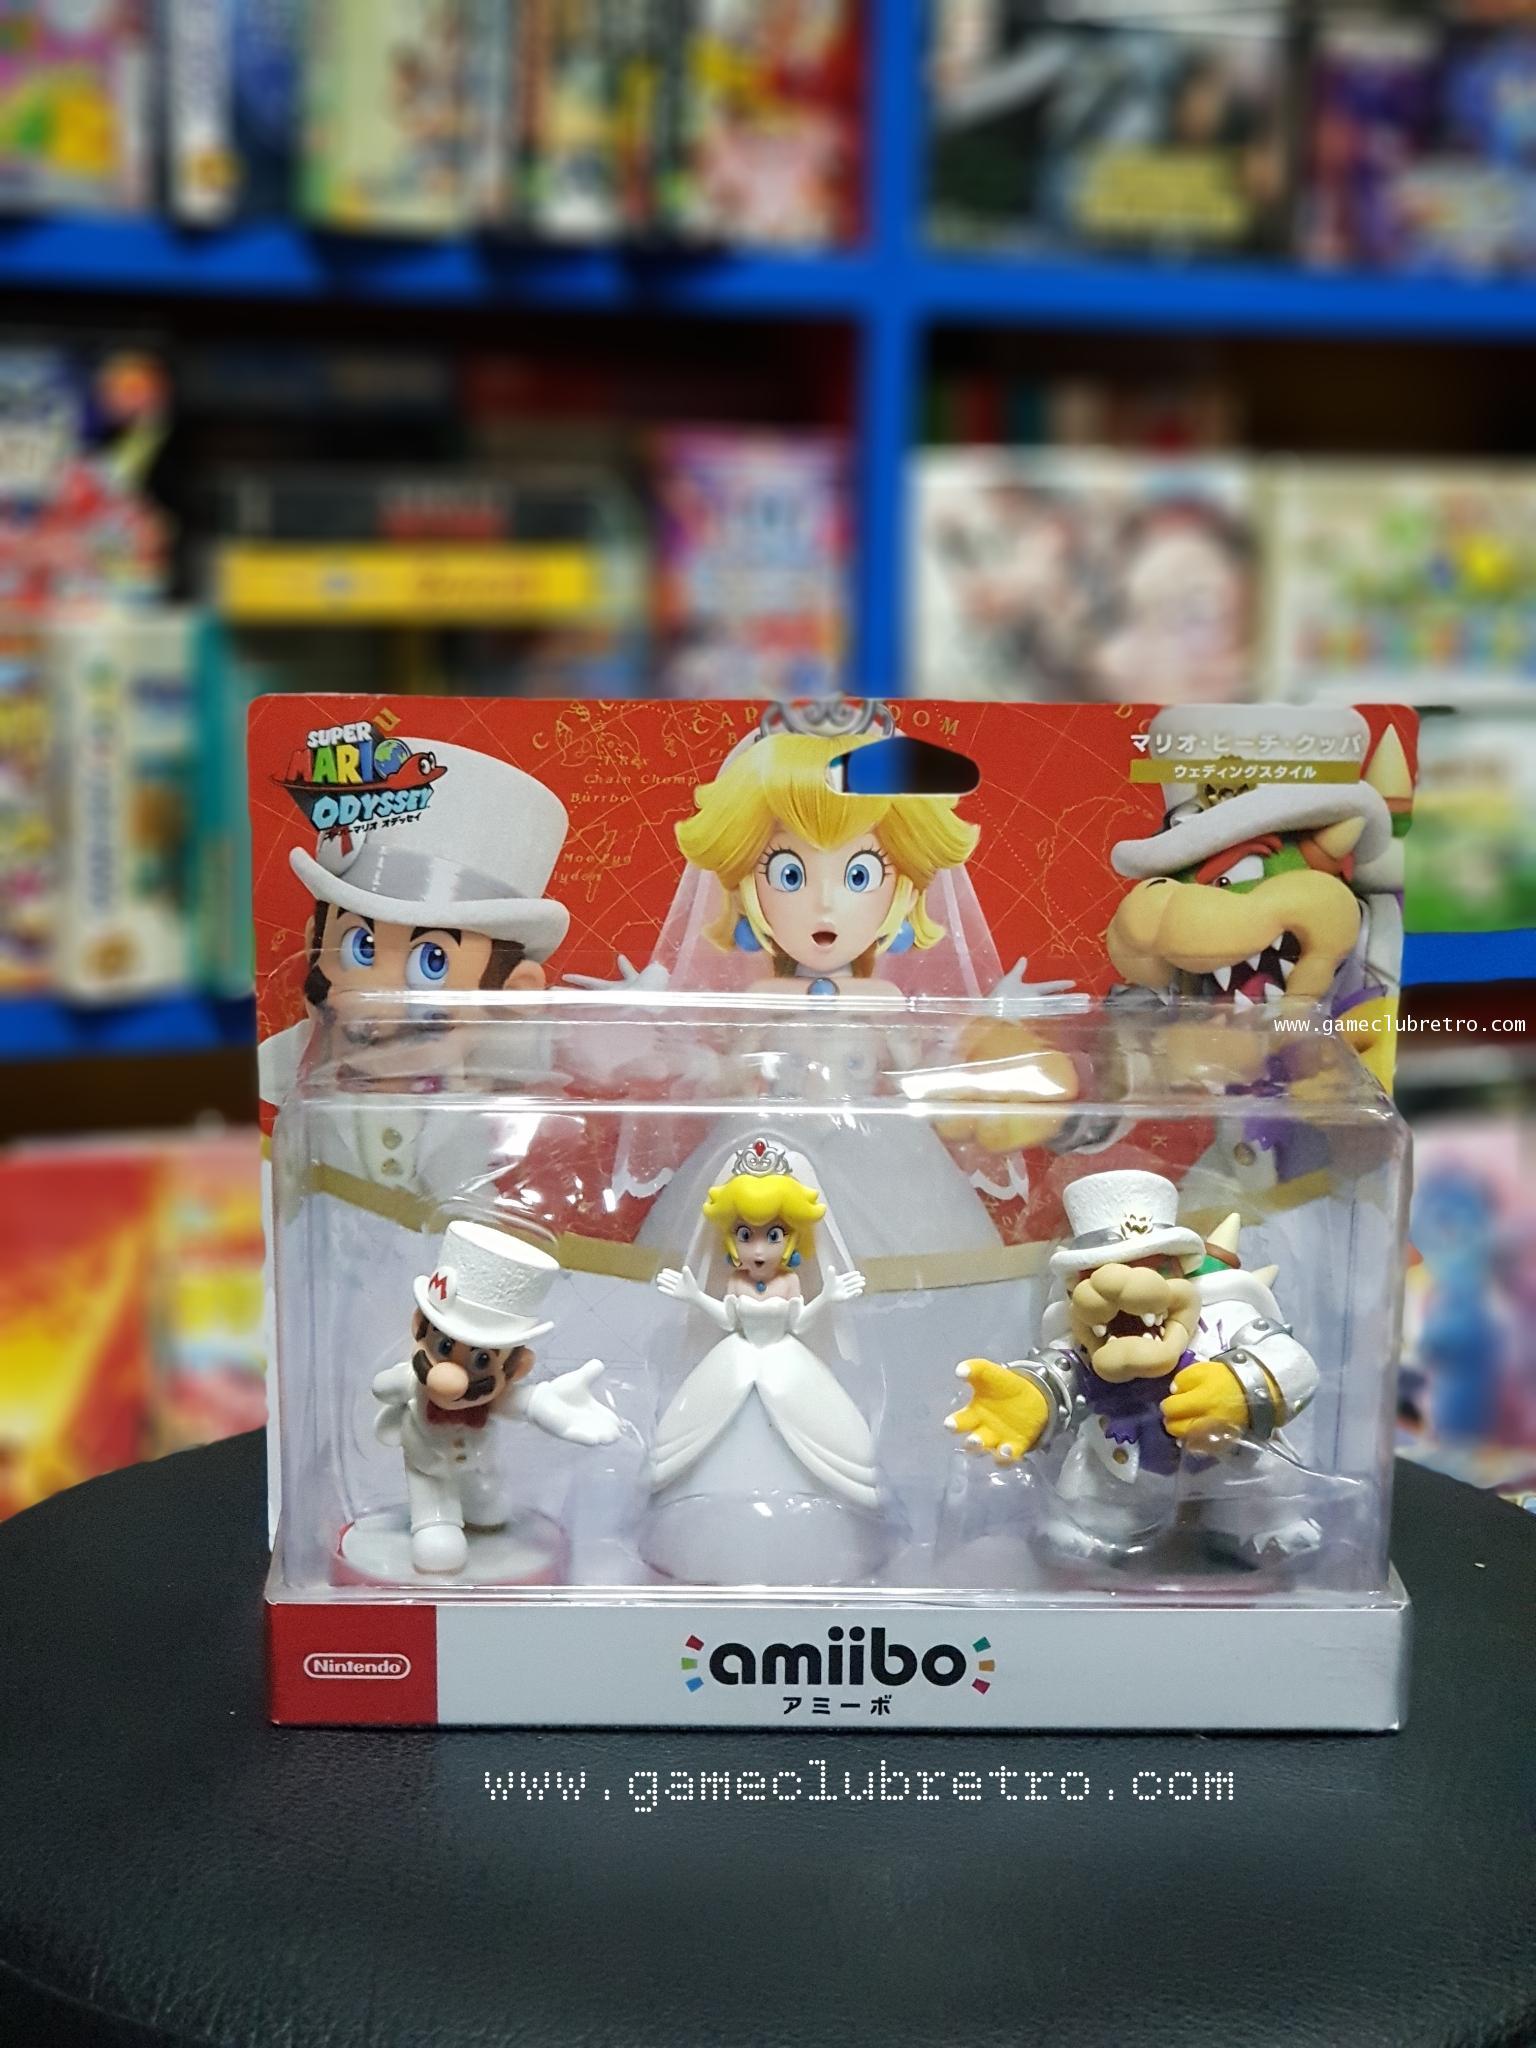 Amiibo Mario Oddesey Set 3